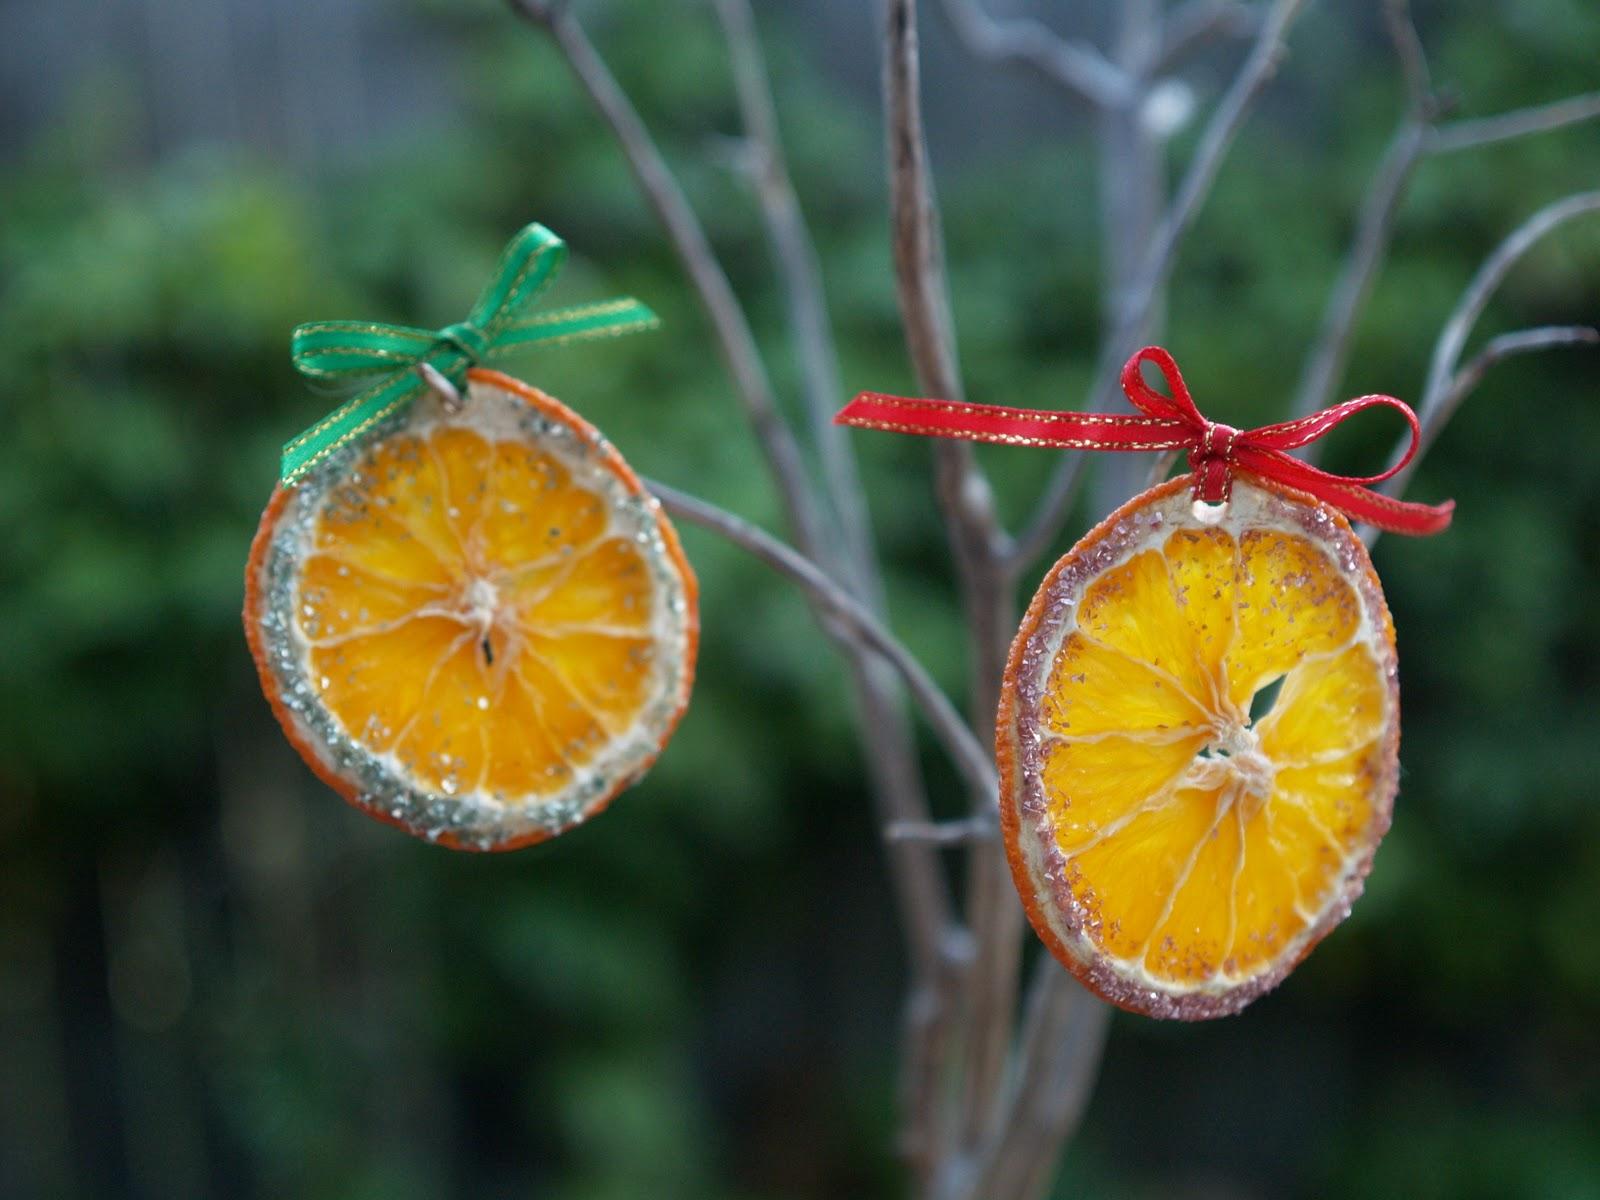 Homemade Christmas Decorations Dried Orange : Handmade christmas ornaments dried oranges the magic